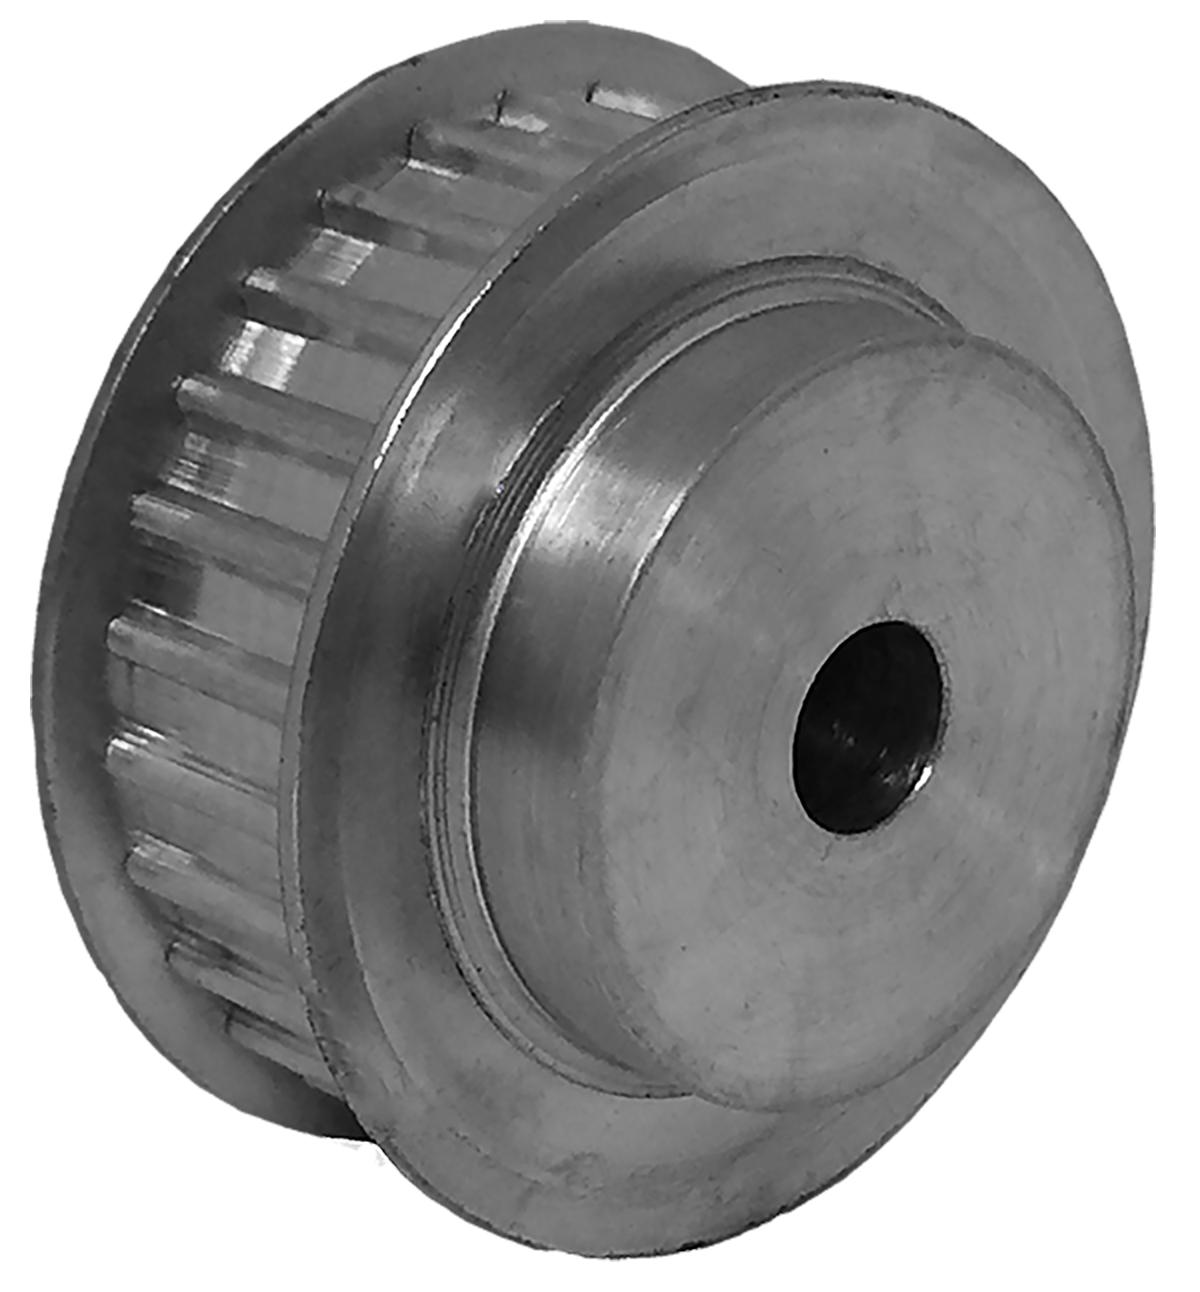 21AT5/27-2 - Aluminum Metric Pulleys